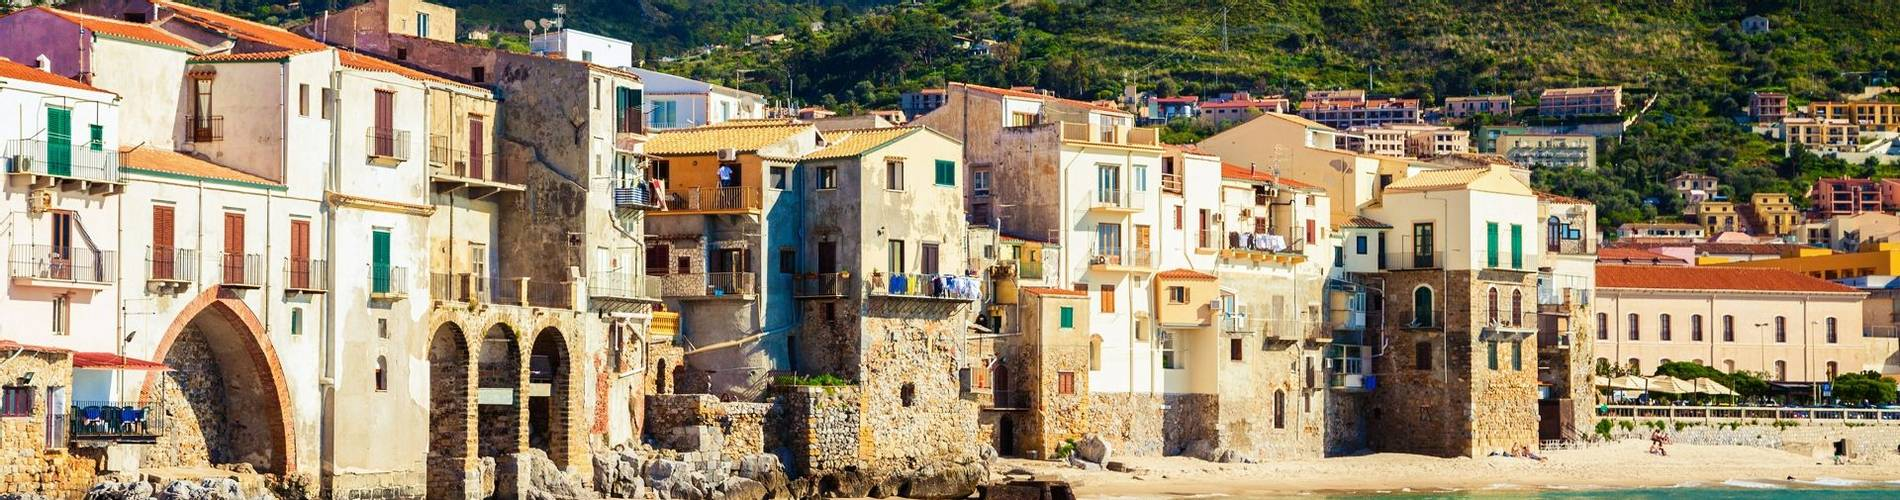 Cefalu Sicily.jpg